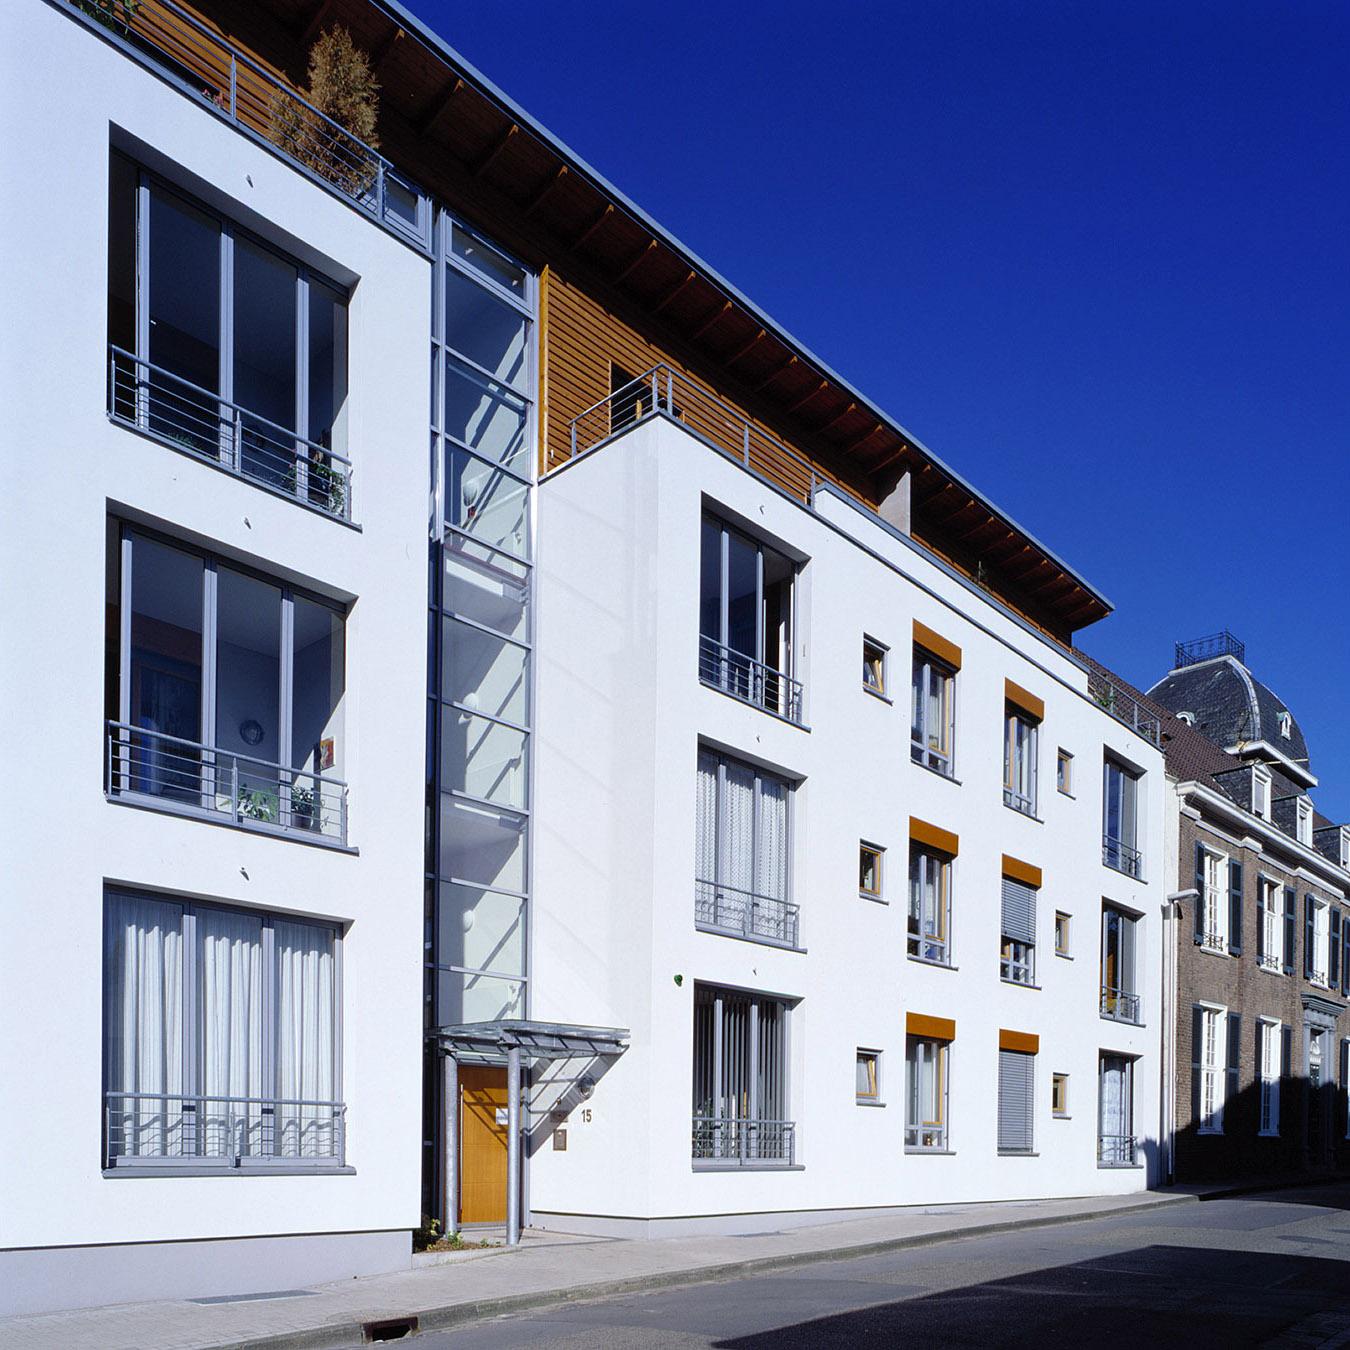 Architekt Kleve st antonius residenz kleve wrede architekten